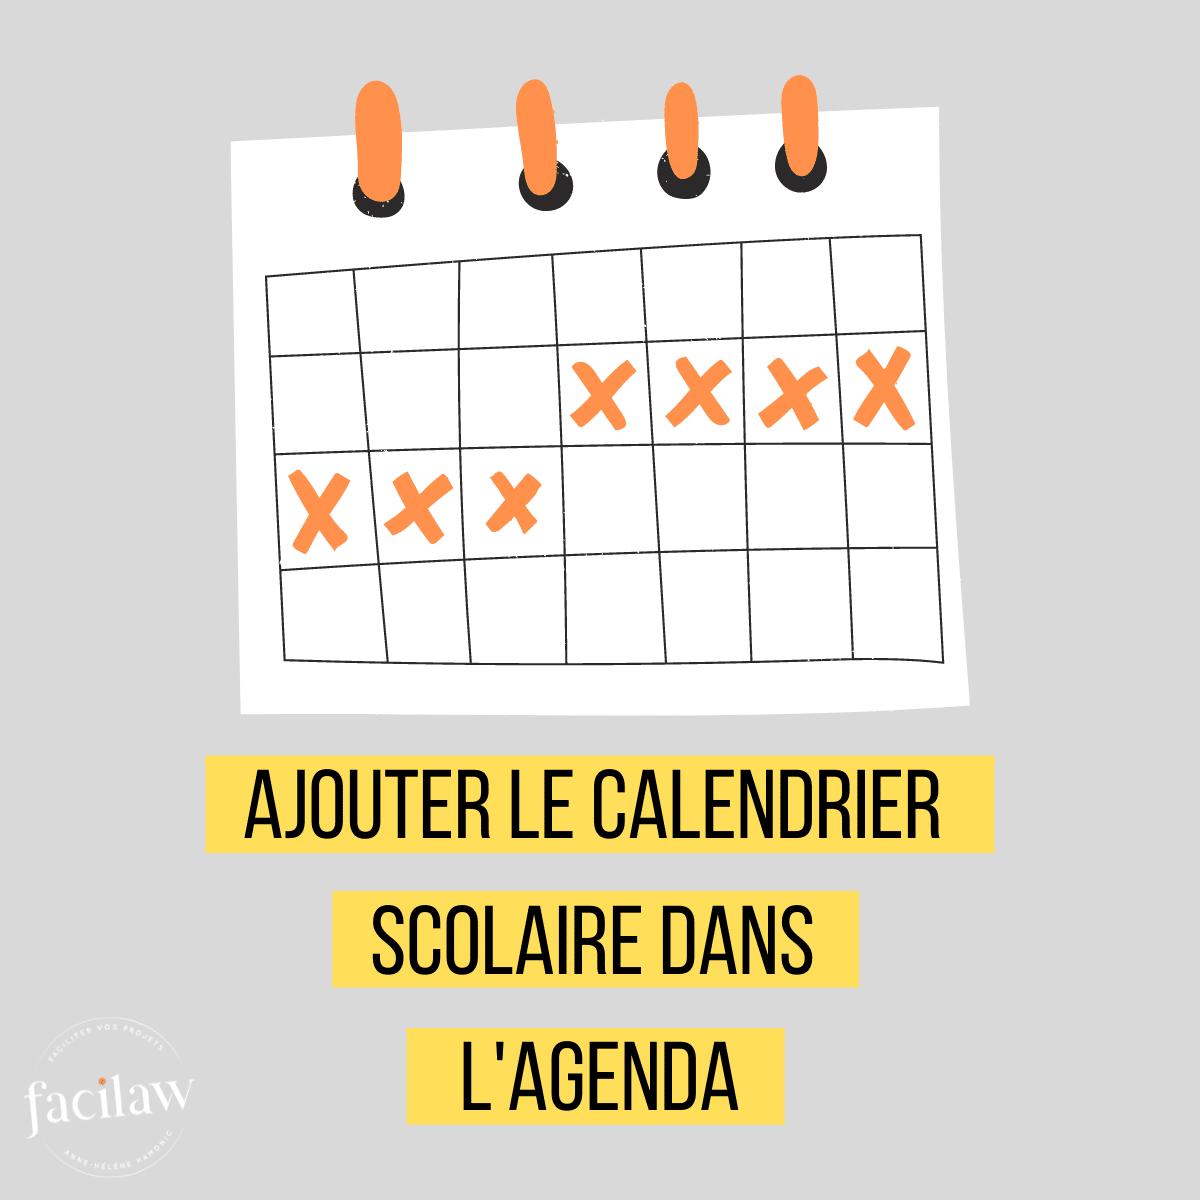 avocats calendrier scolaire,agenda